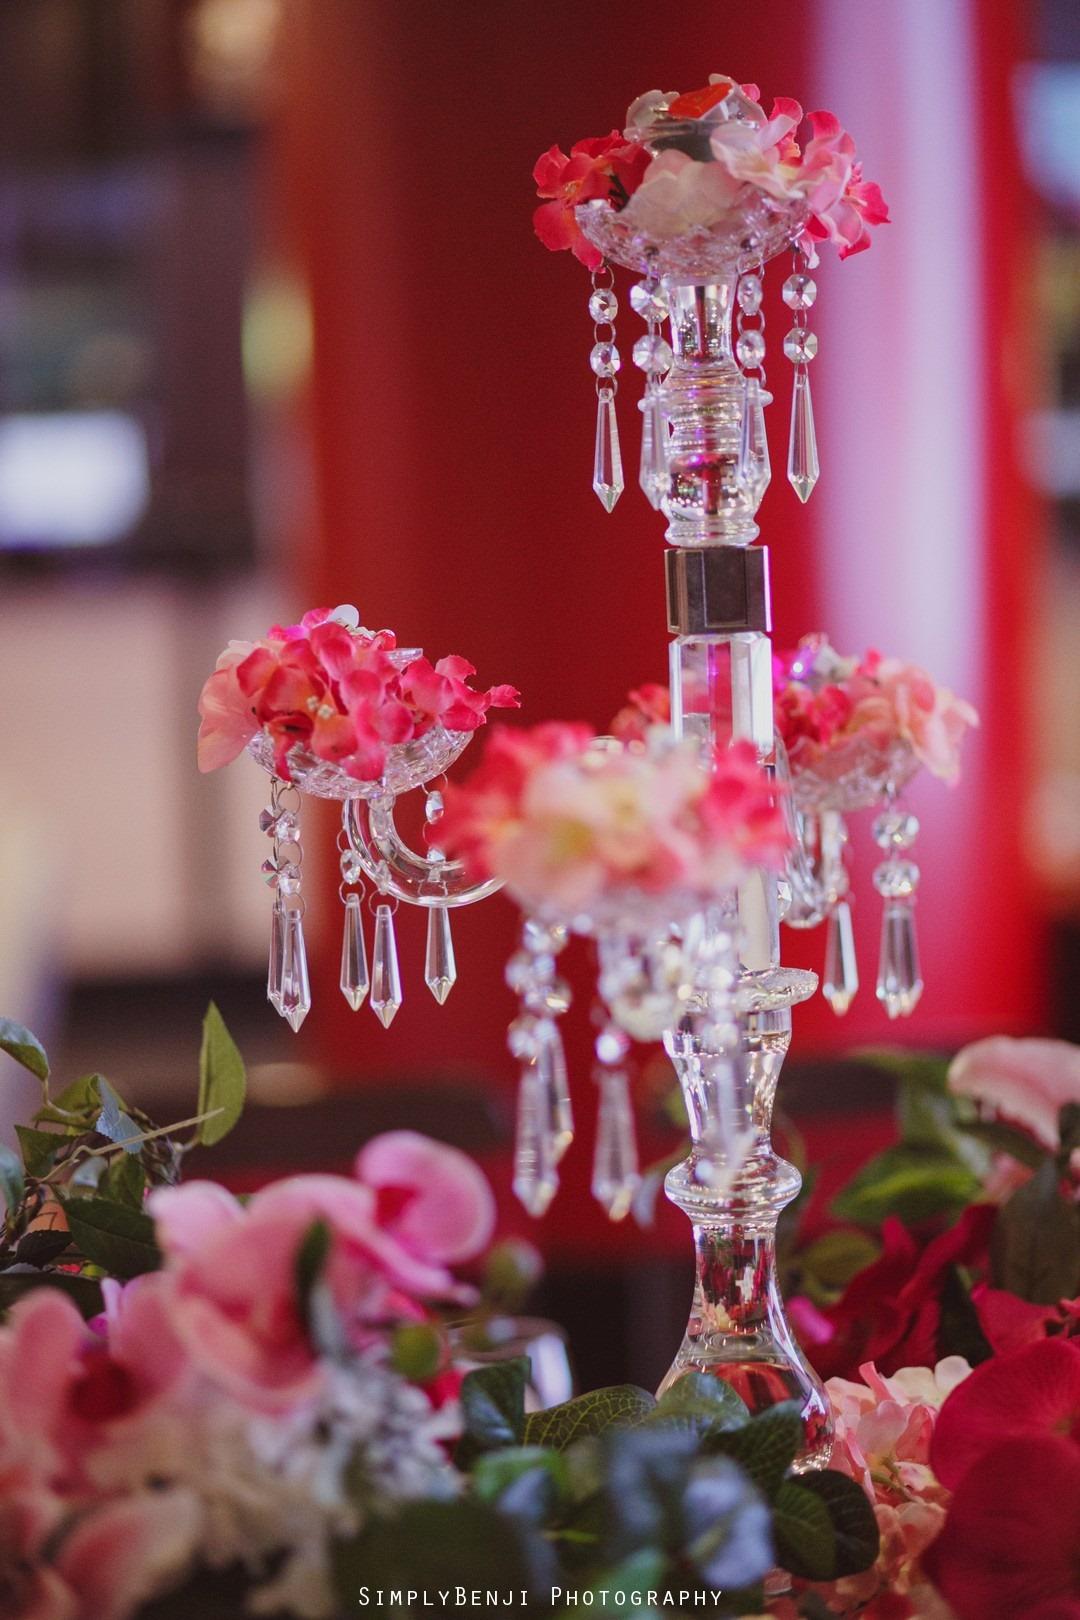 037_Wedding Reception at Extra Super Tanker Restaurant Glo Damansara_003